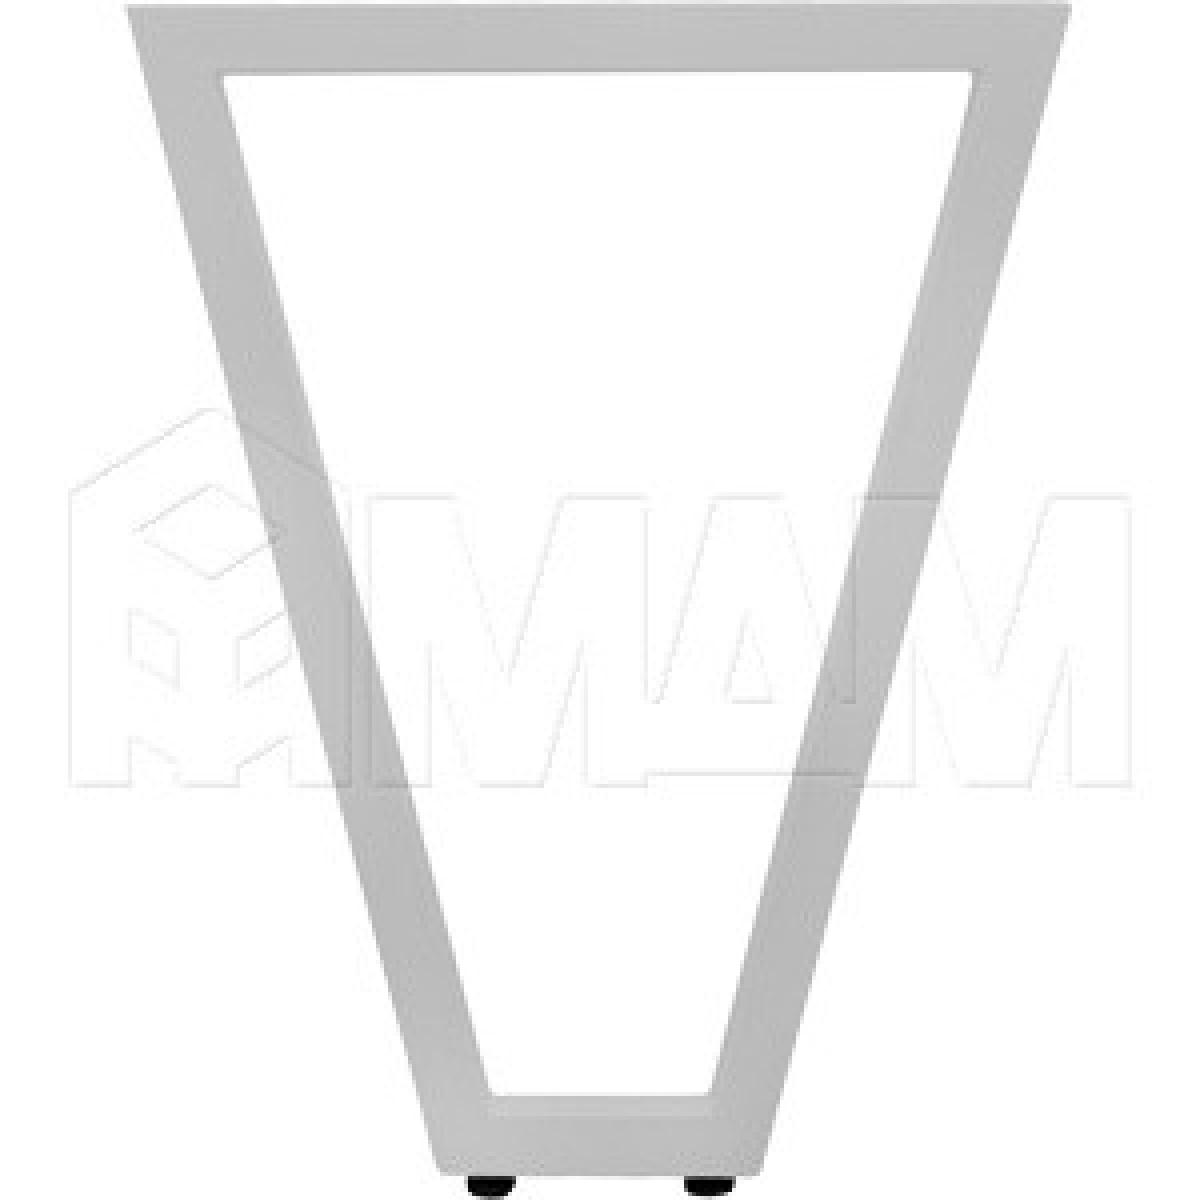 Опора для стола V-образная, 40х40, H720+5мм, хром матовый, 1шт.